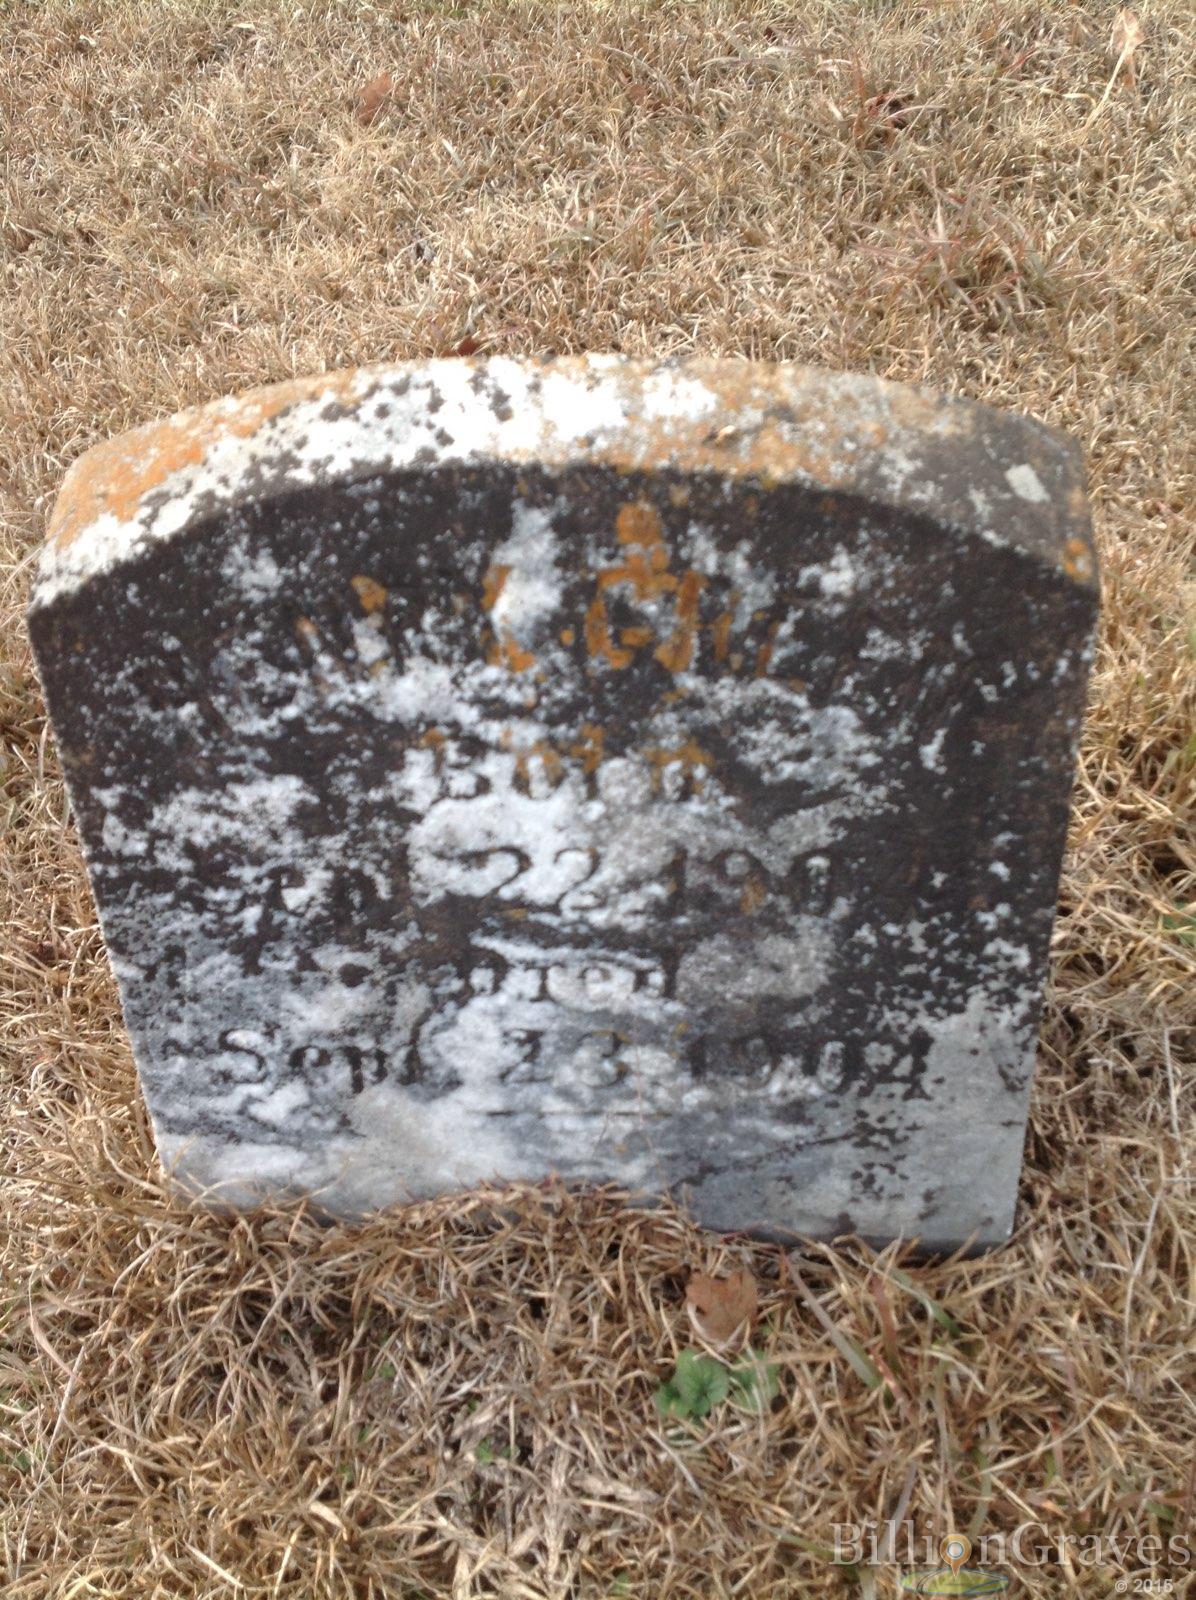 BillionGraves, gravestone, grave, damaged gravestones, cemetery, family history, ancestors, community service project, JustServe, BillionGraves app, ivy, plant growth, alabama, JustServe